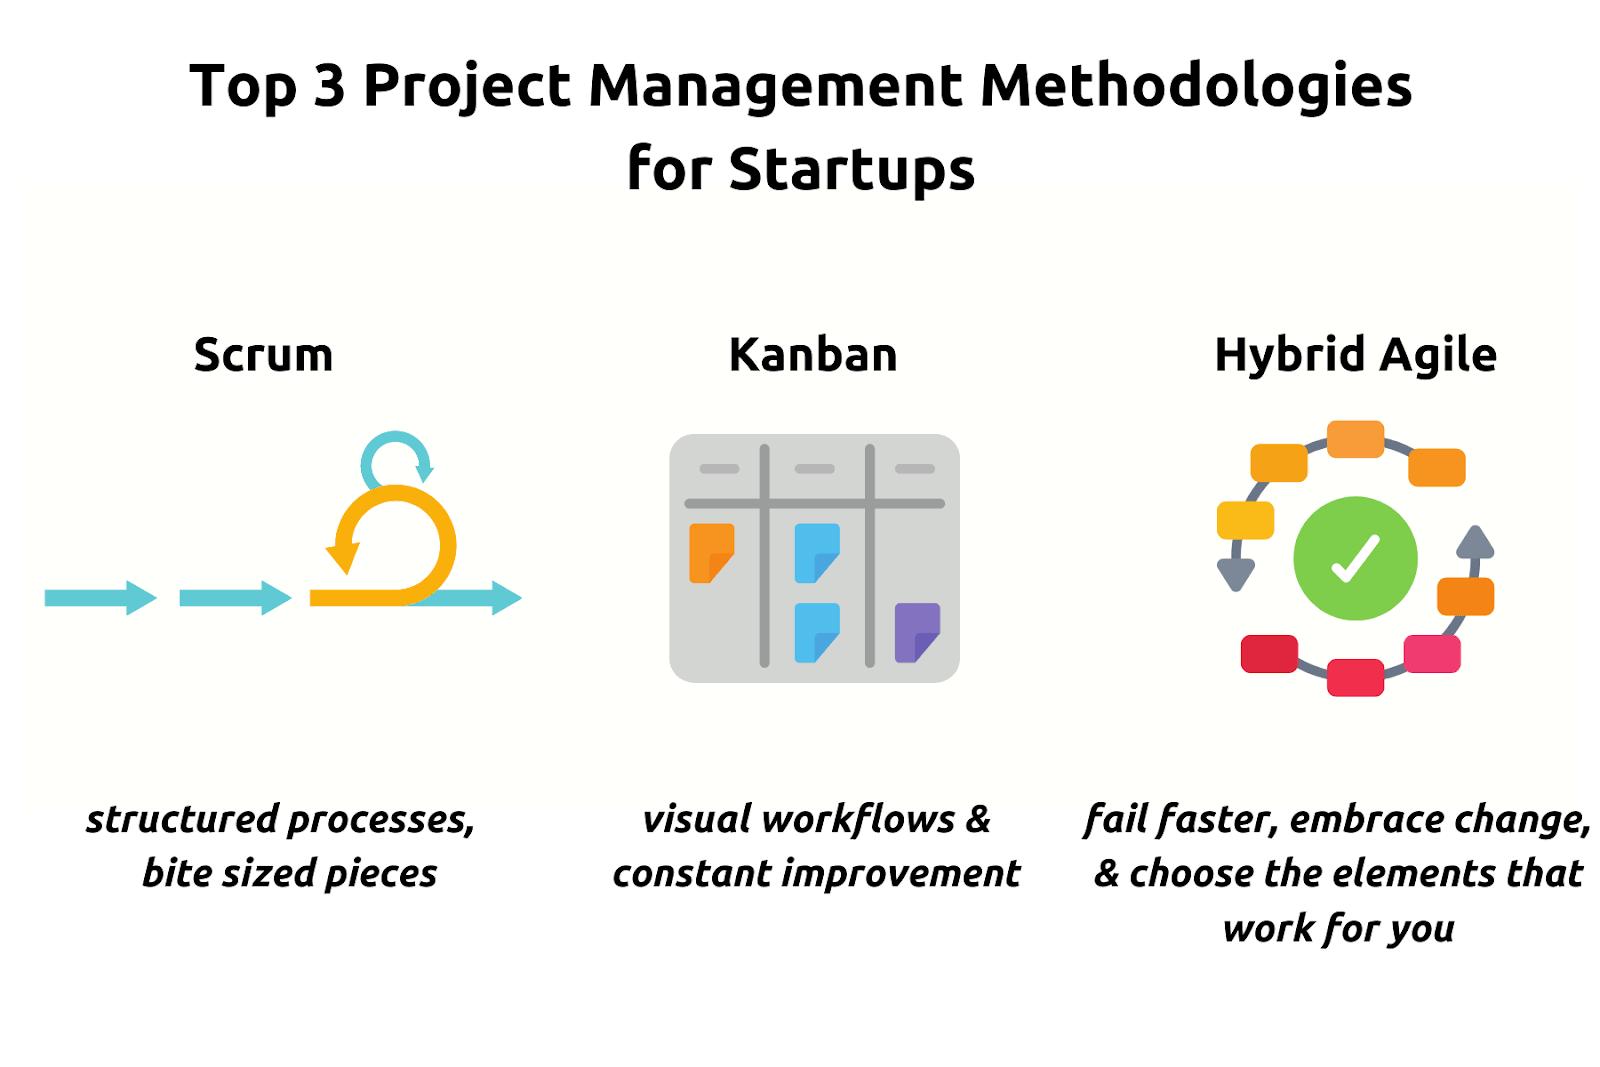 Top 3 project management methodologies for startups